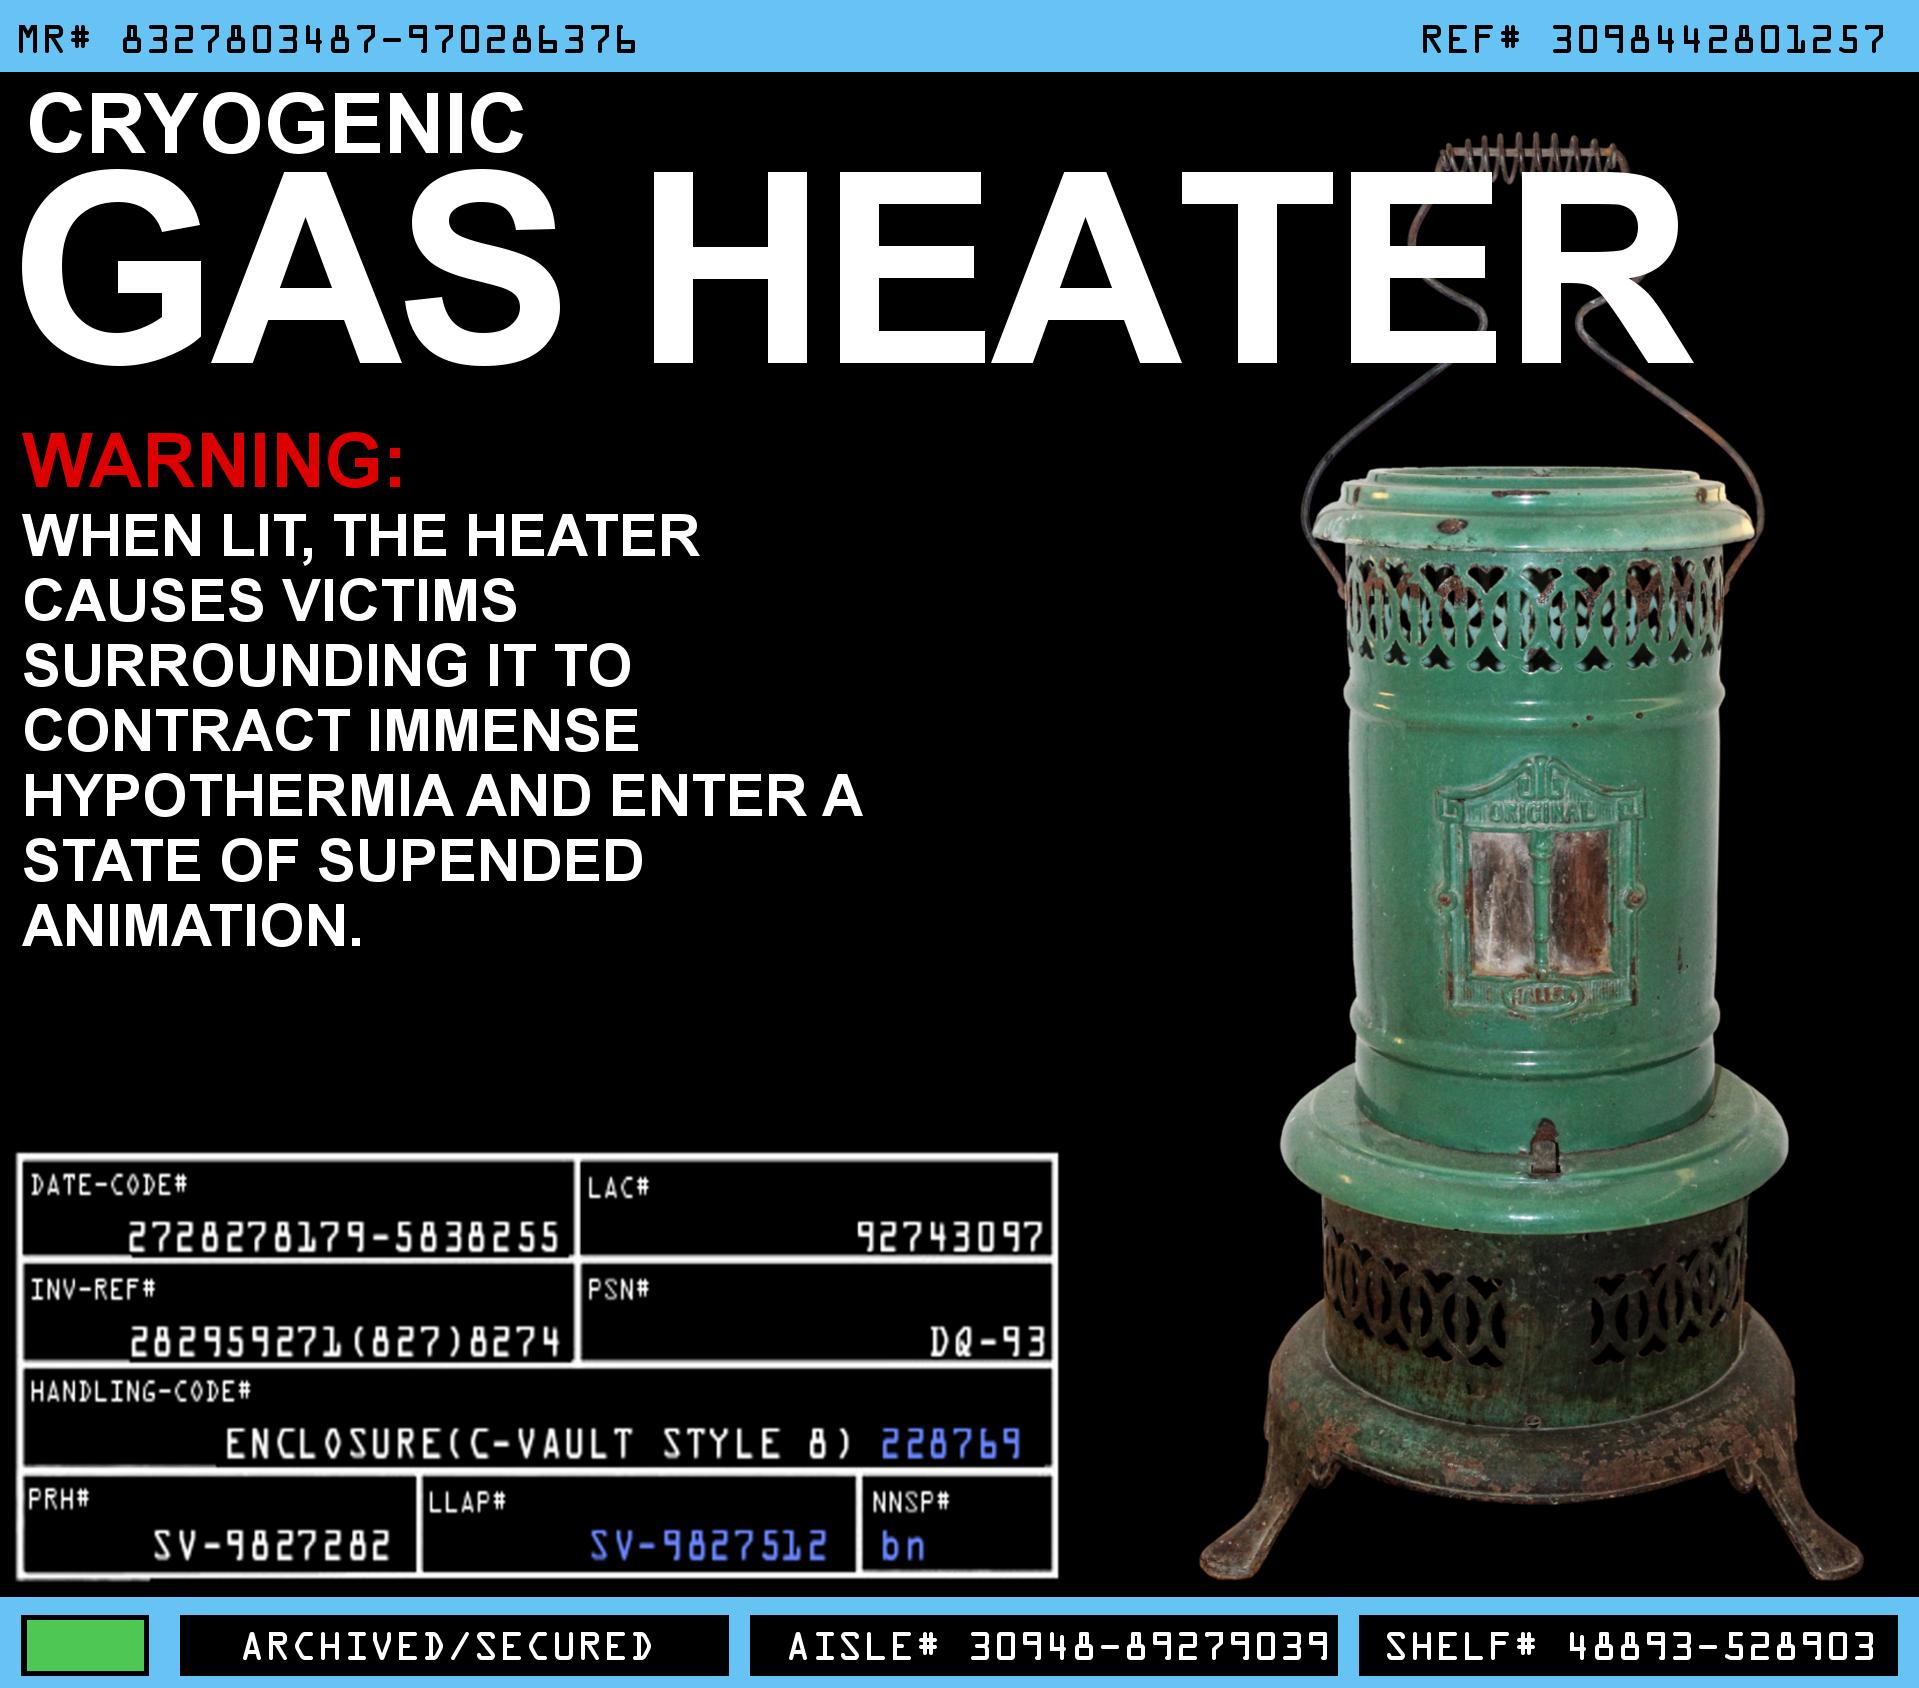 Cryogenic Gas Heater